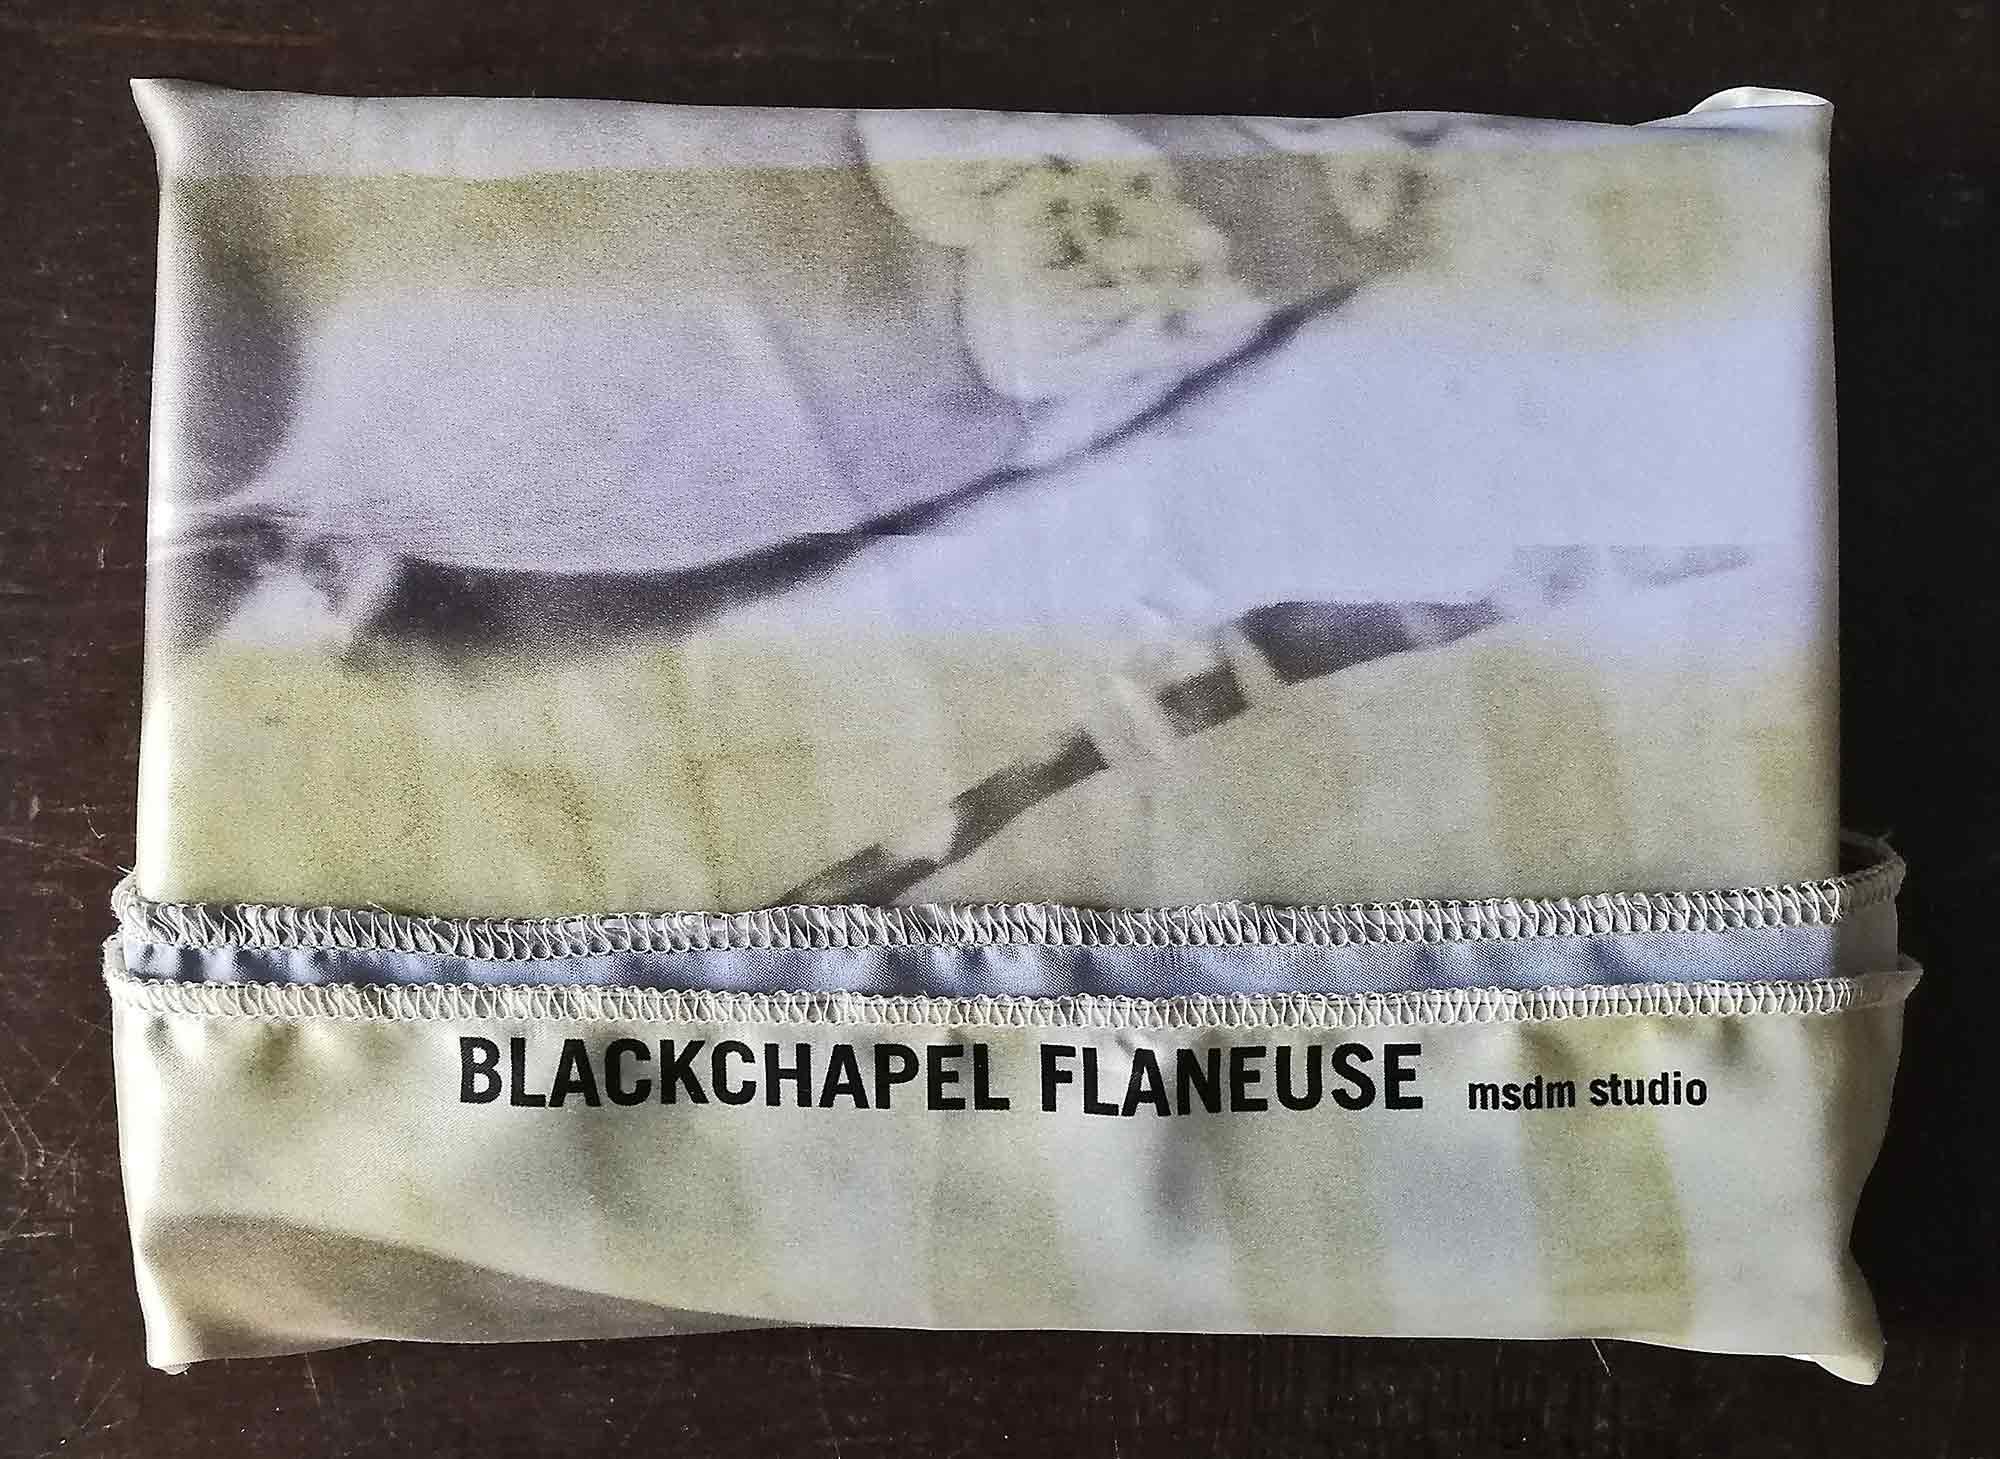 msdm-blackchapel-glaneuse-04